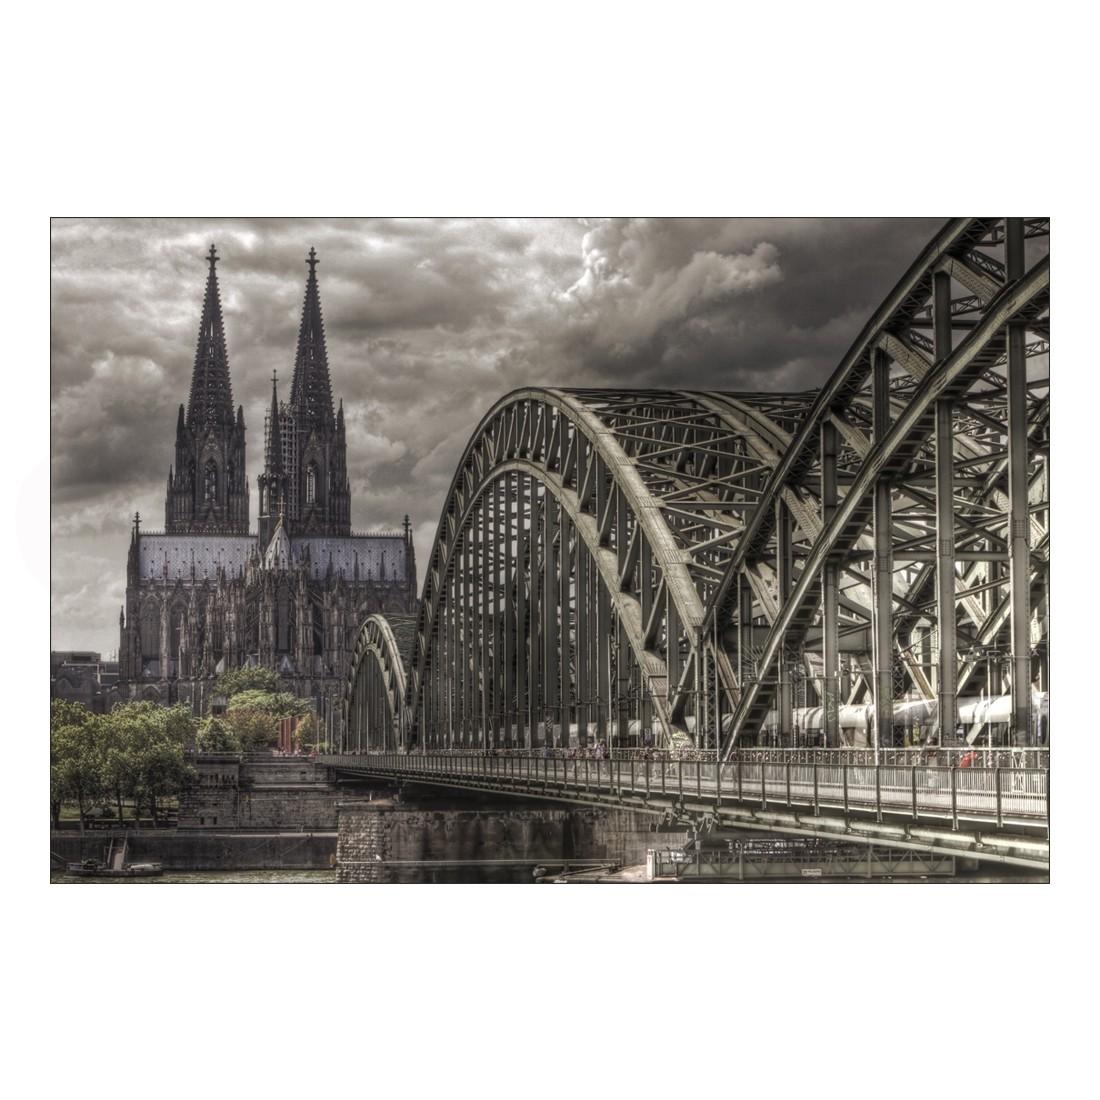 Acrylglasbild Hohenzollernbrücke Köln – Abmessung 90×60 cm, Gallery of Innovative Art bestellen